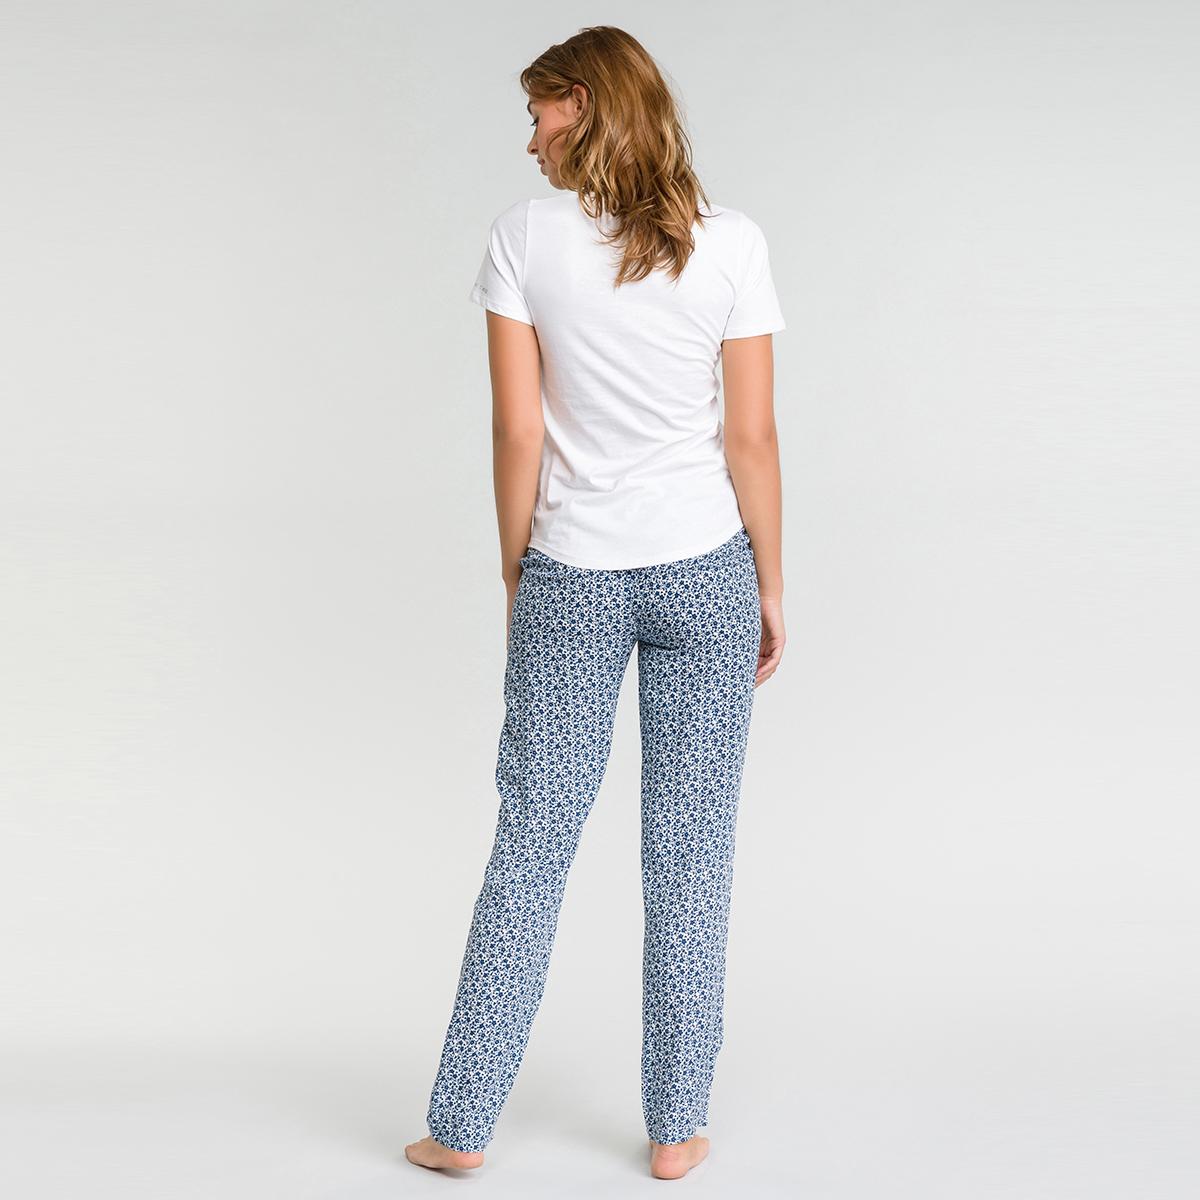 51fa87ae8d085 ... DIM Pantalon pyjama bleu à imprimé fleuri blanc - Fashion, , DIM